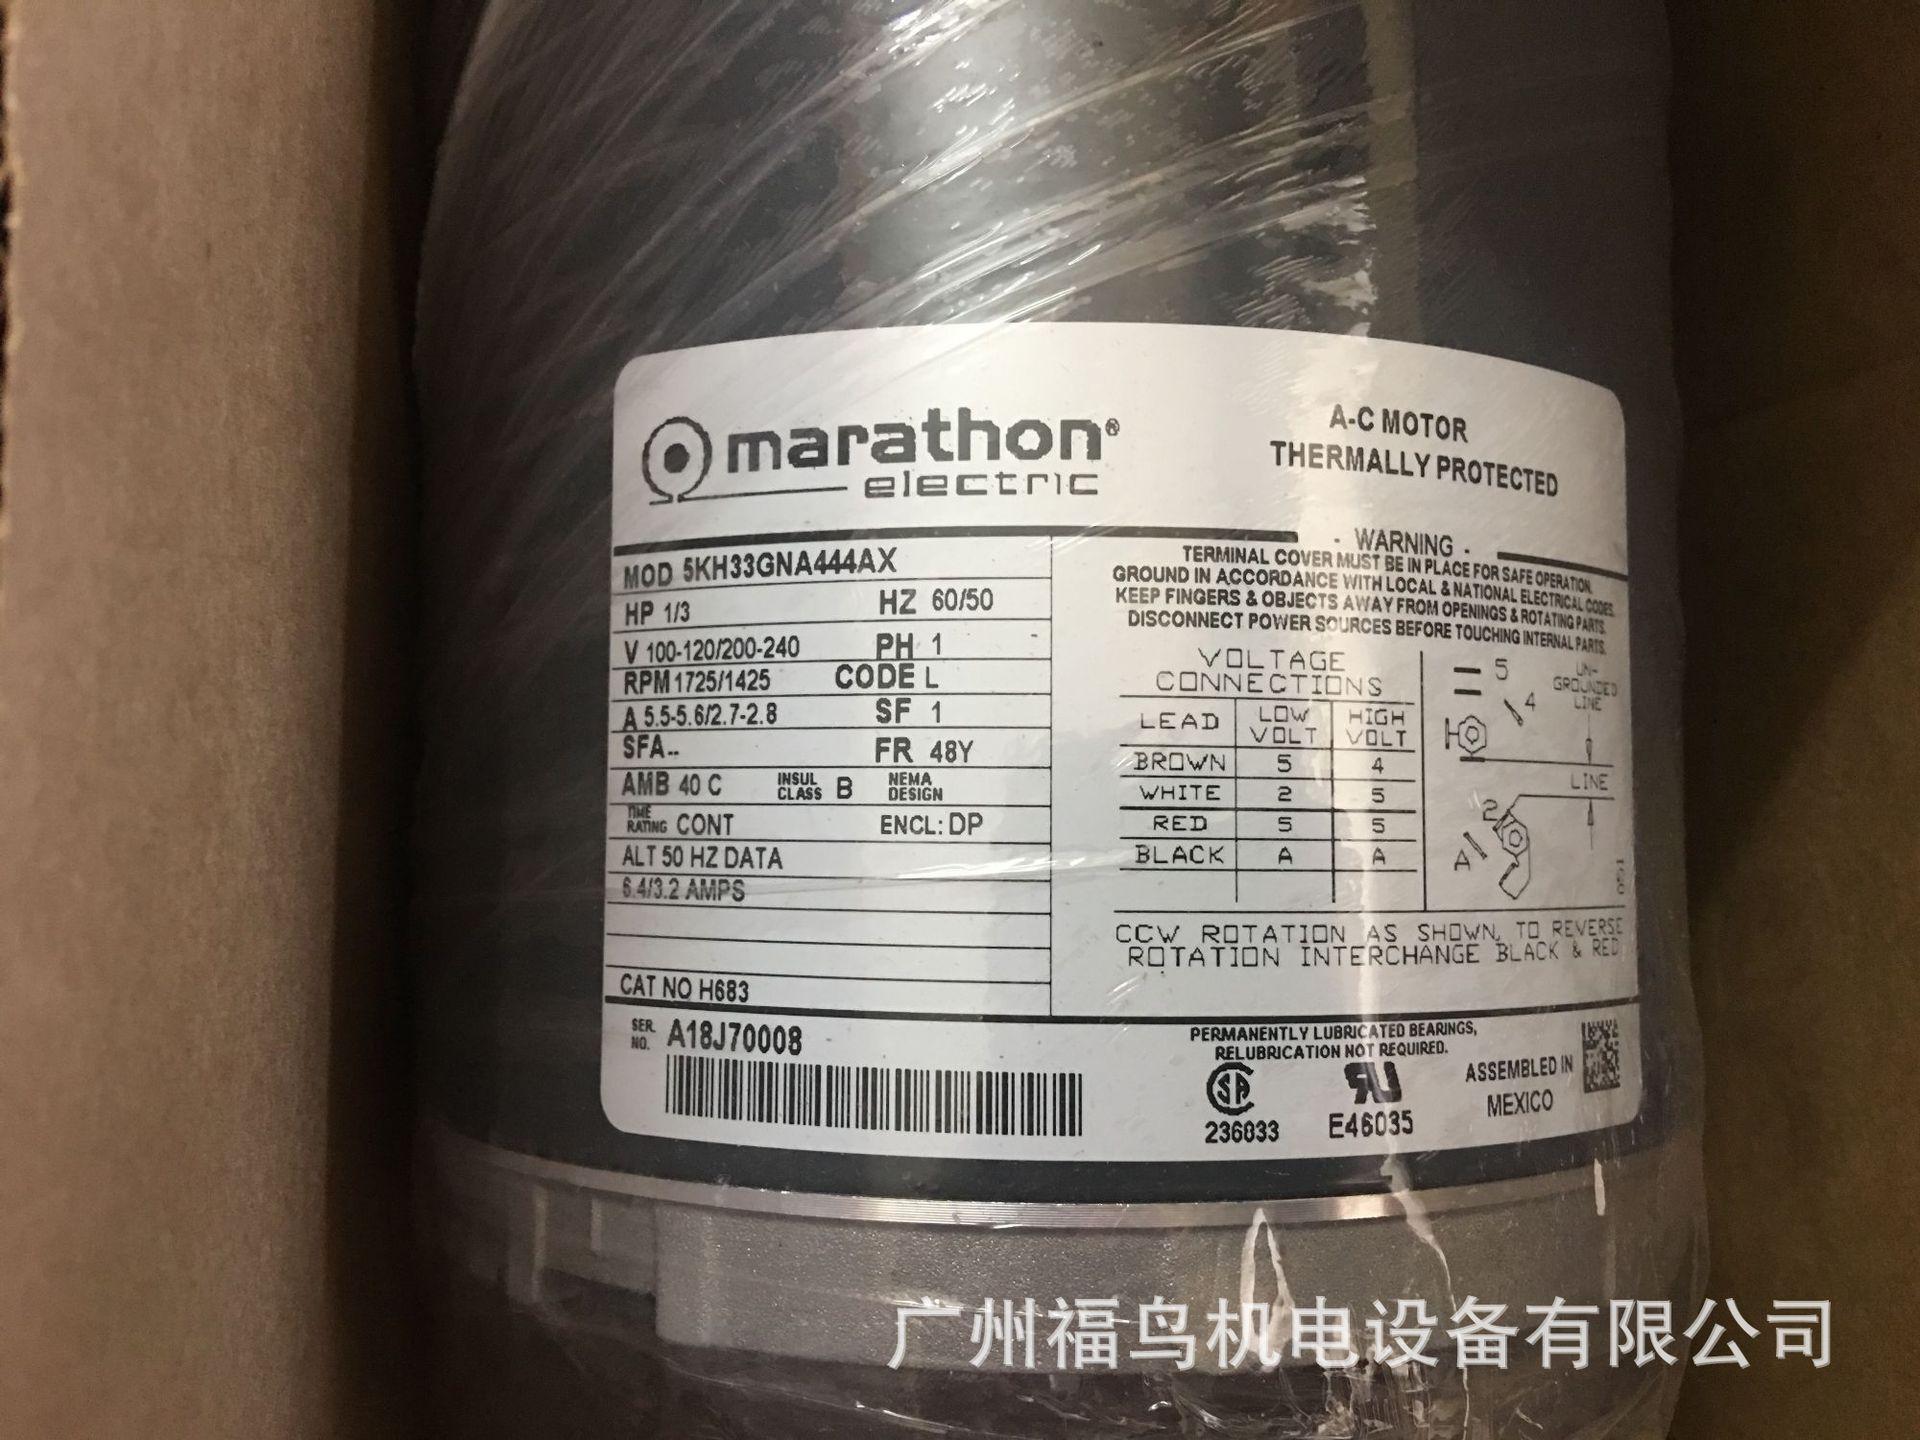 MARATHON电机, 型号: 5KH33GNA444AX